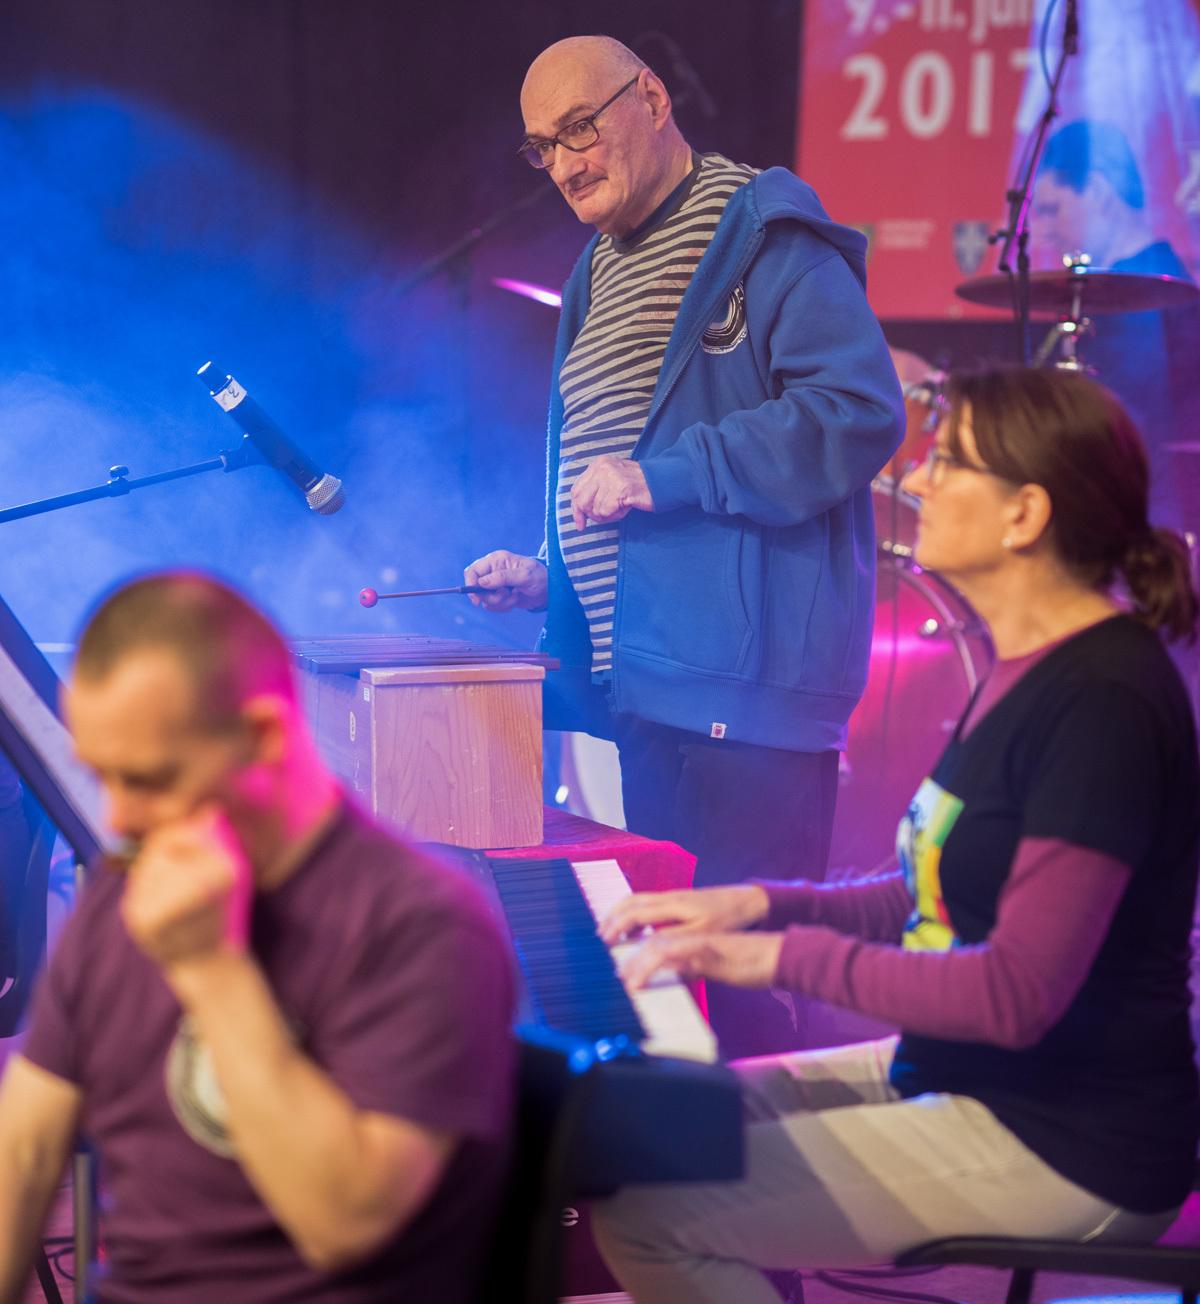 Fyrfestivalen-2017-42.jpg